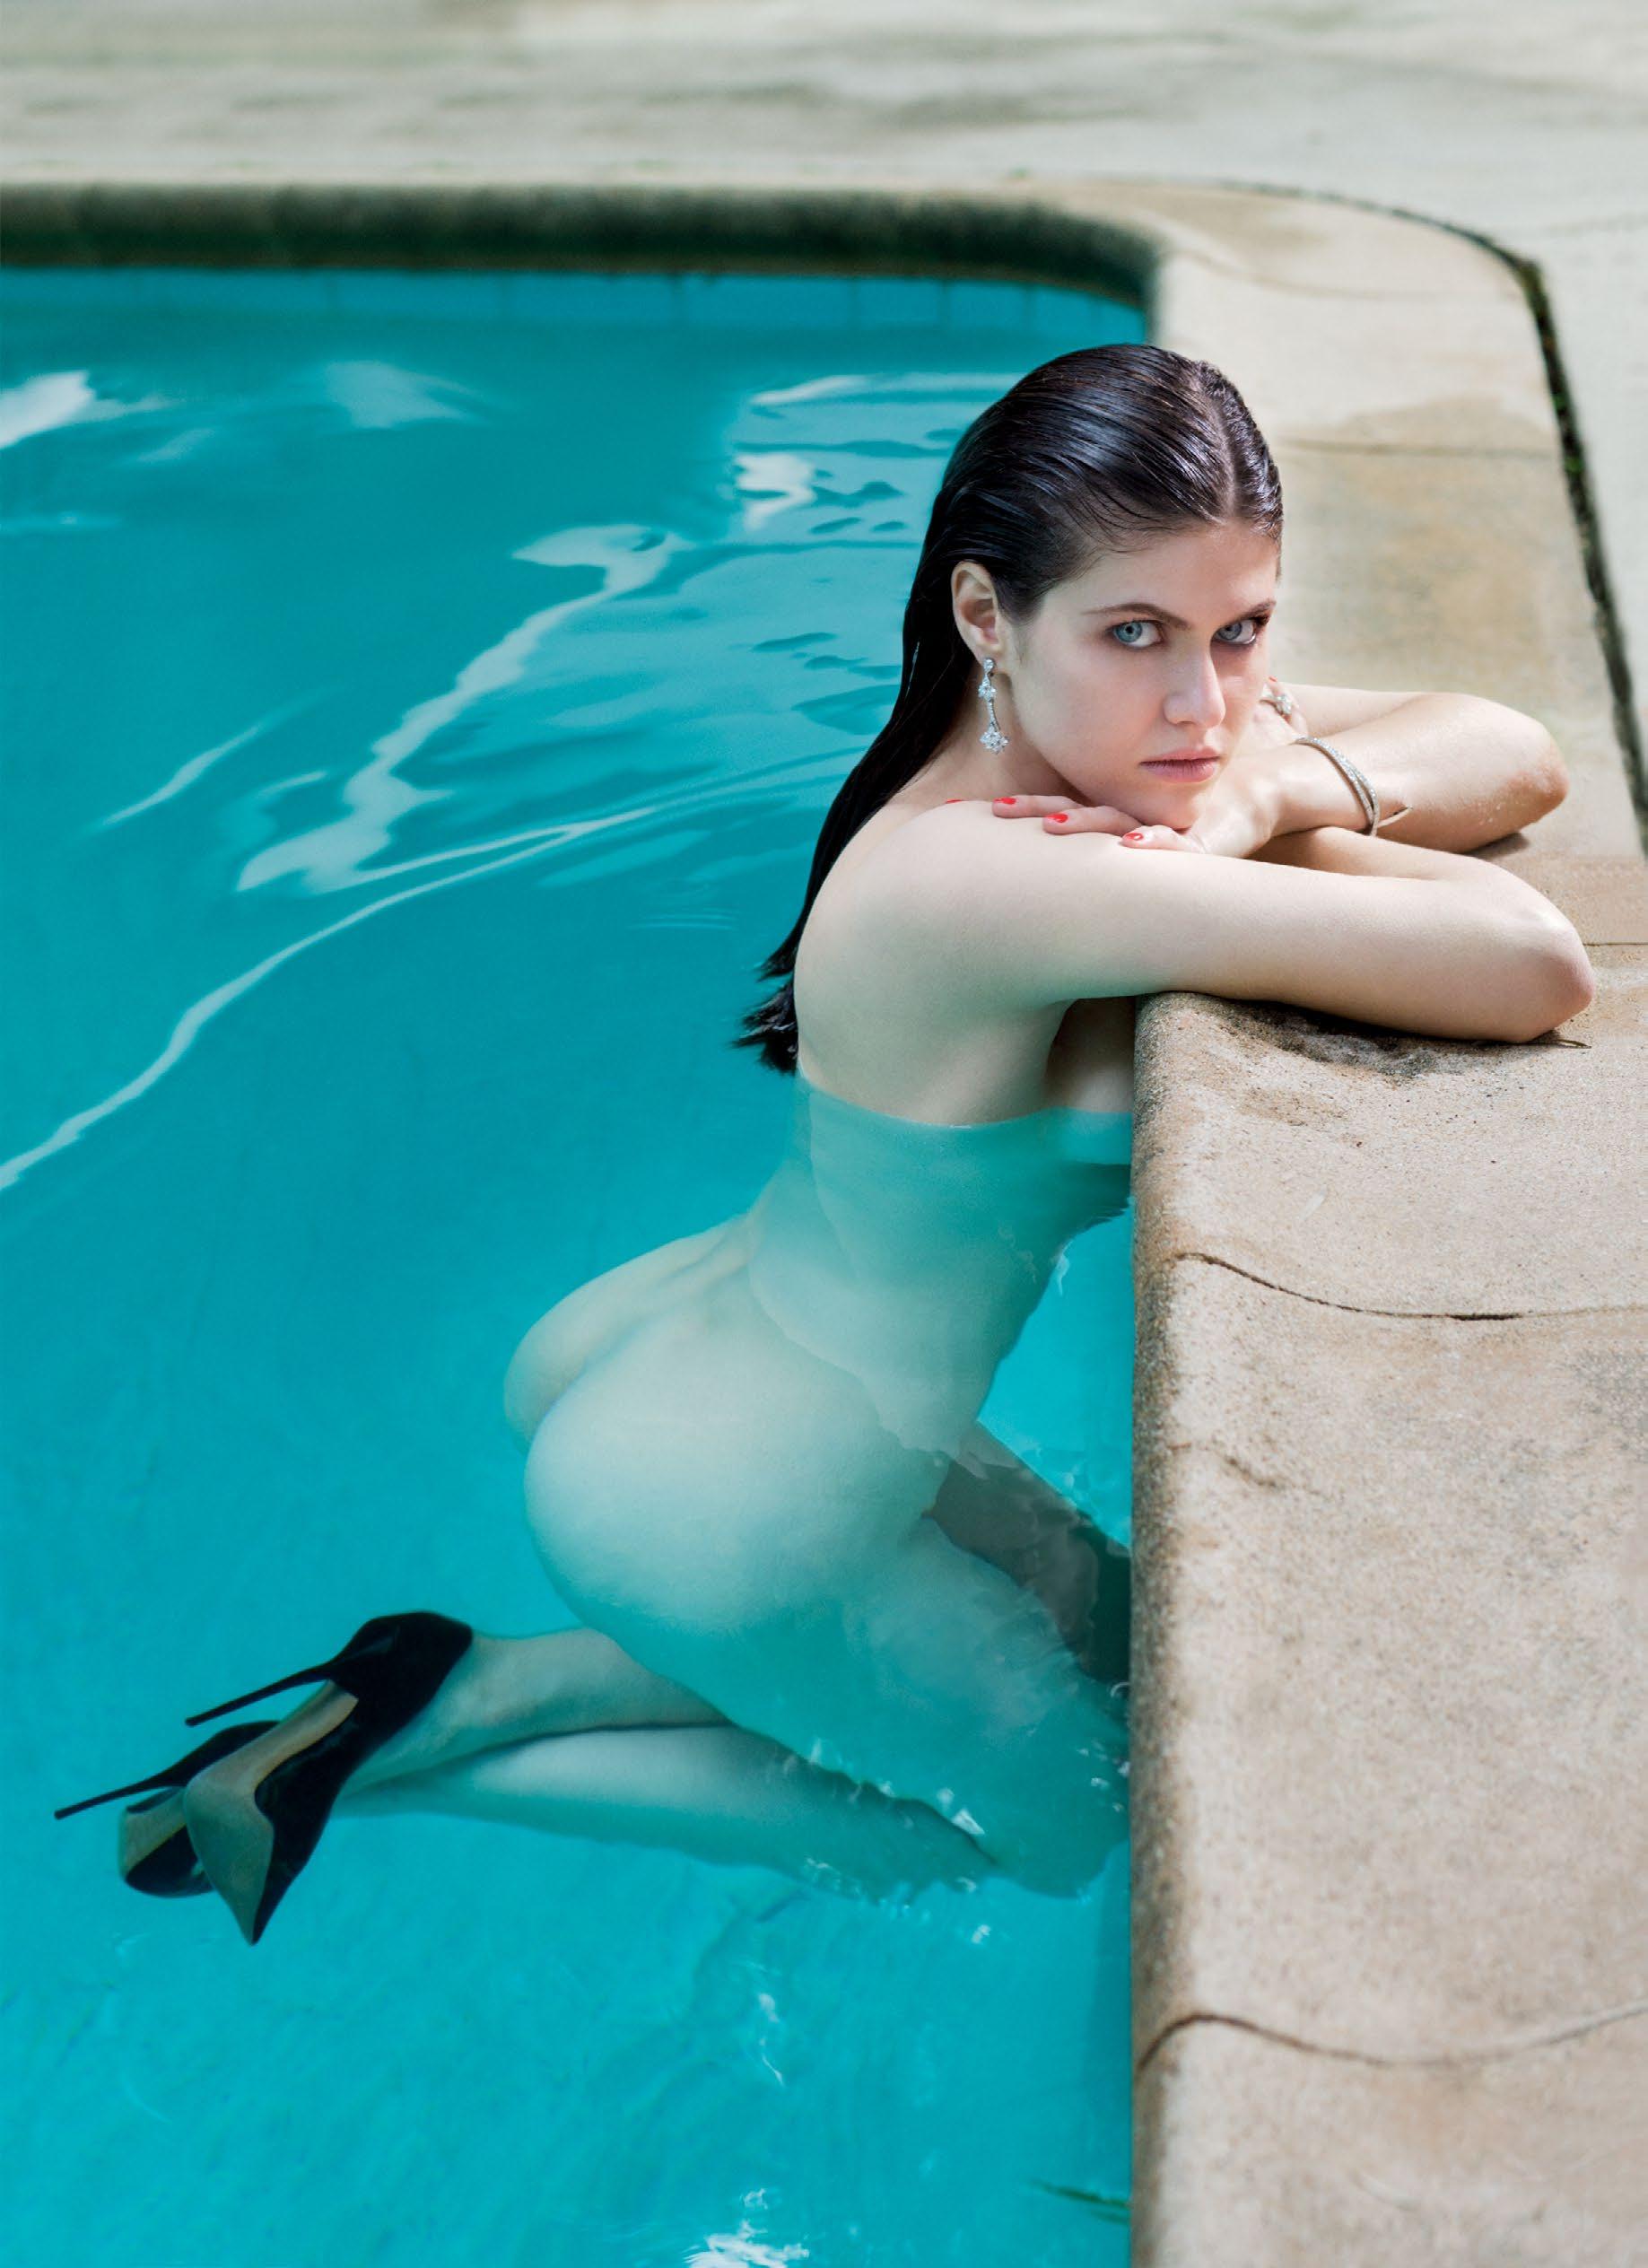 Alexandra Daddario fappening leak